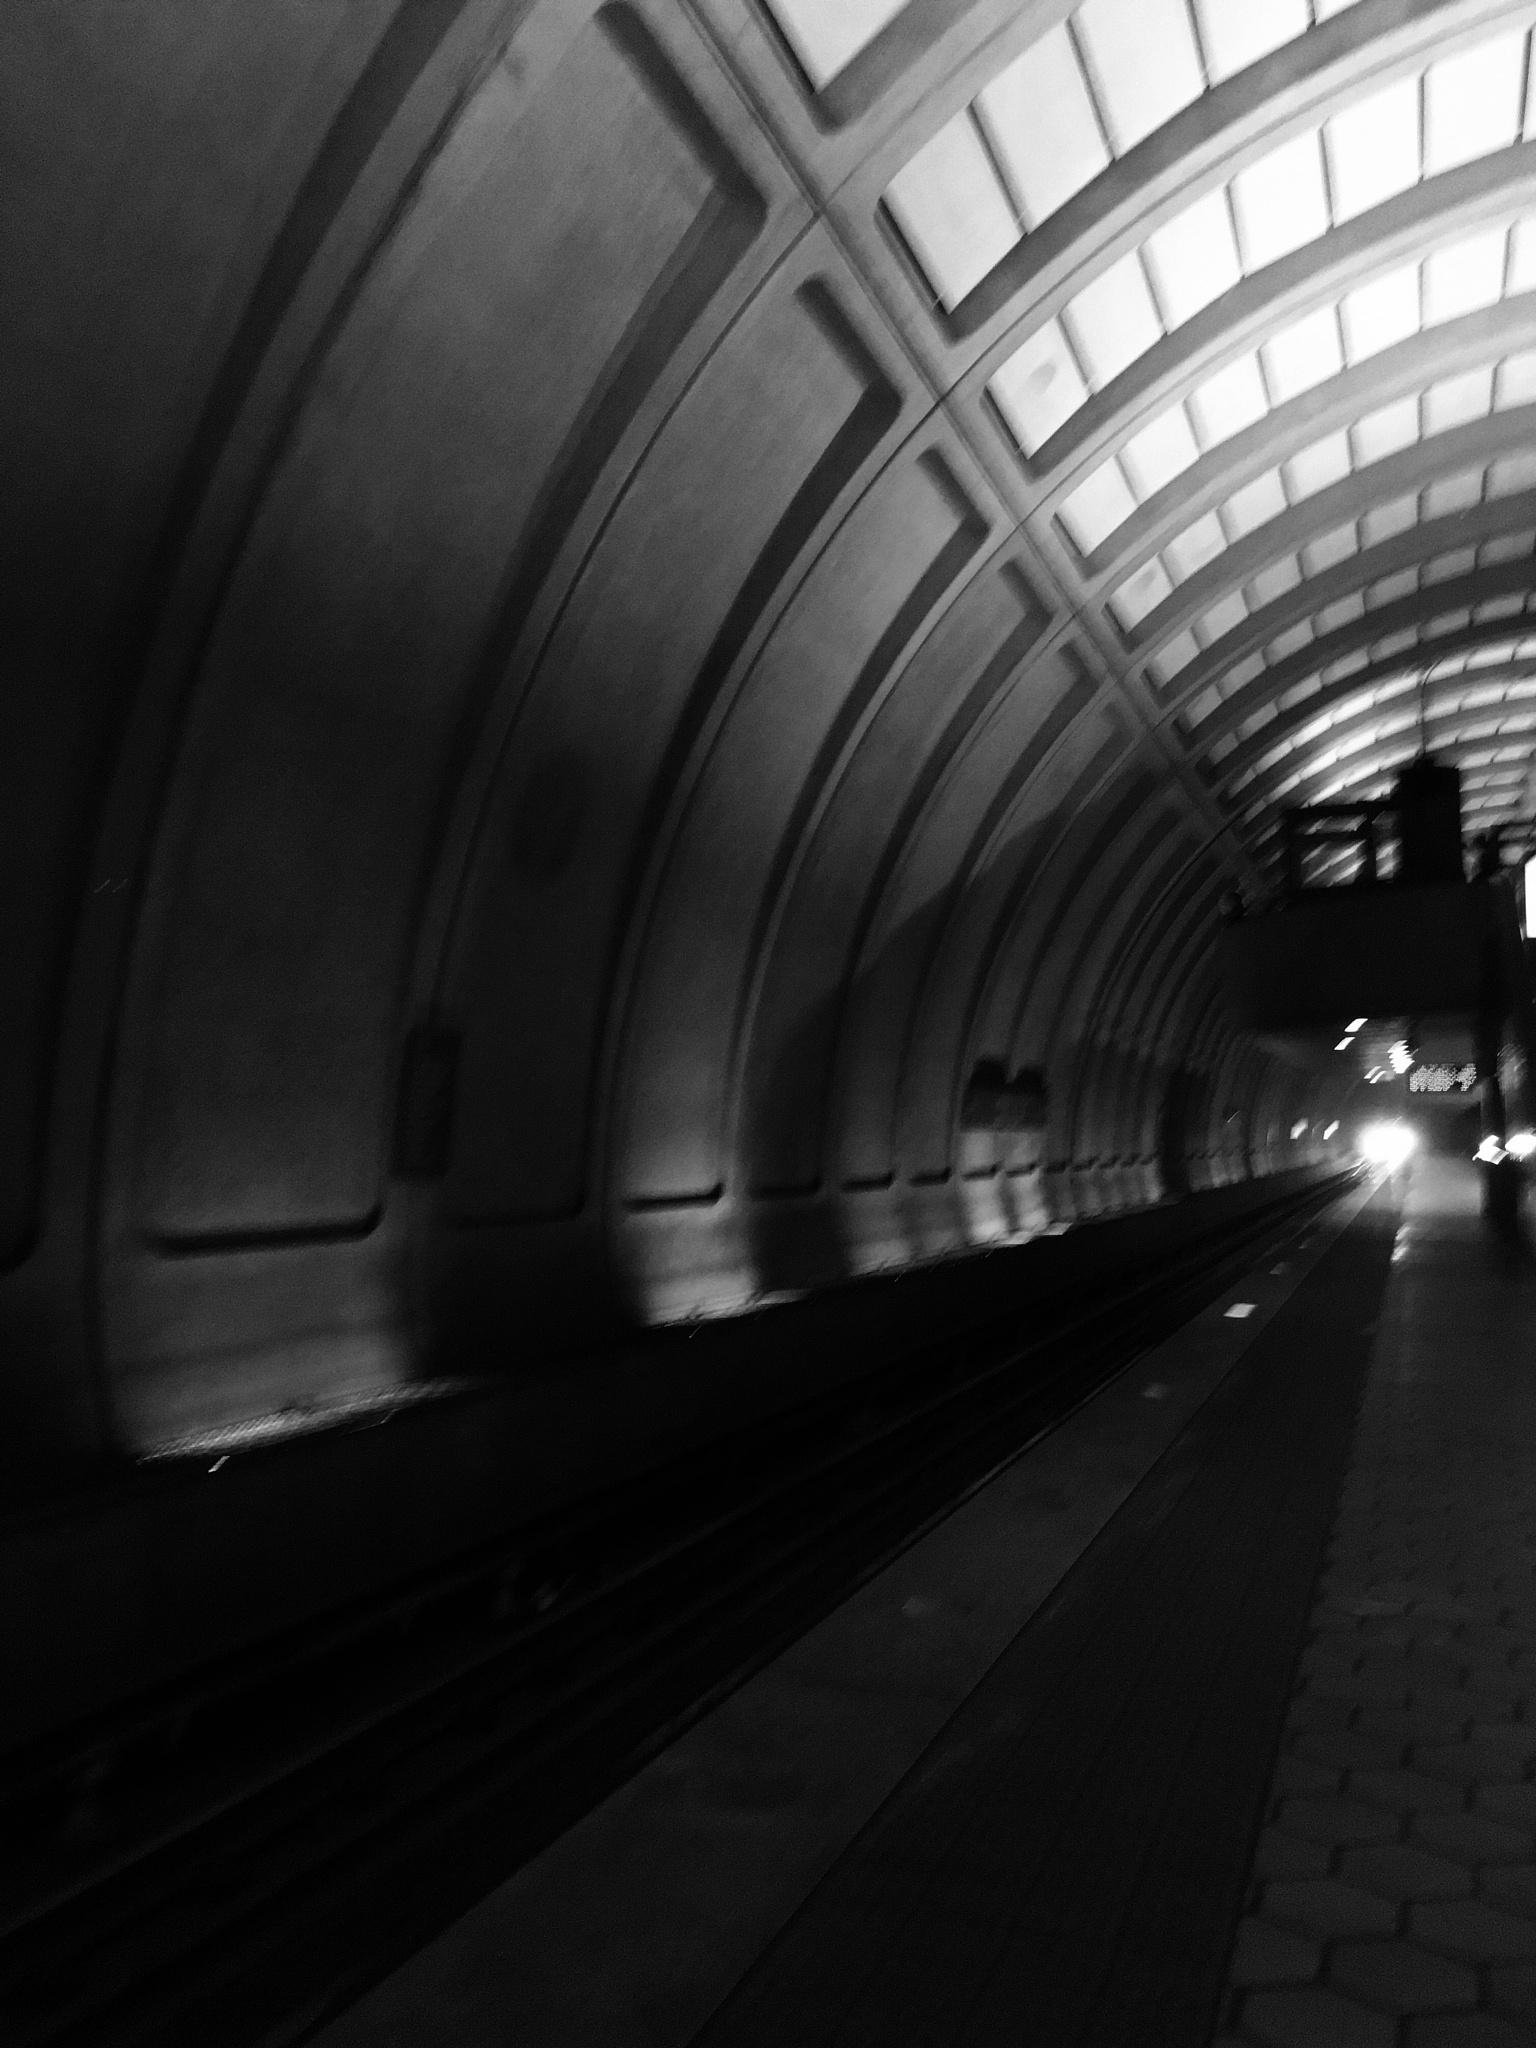 Under metros power by glassworx2